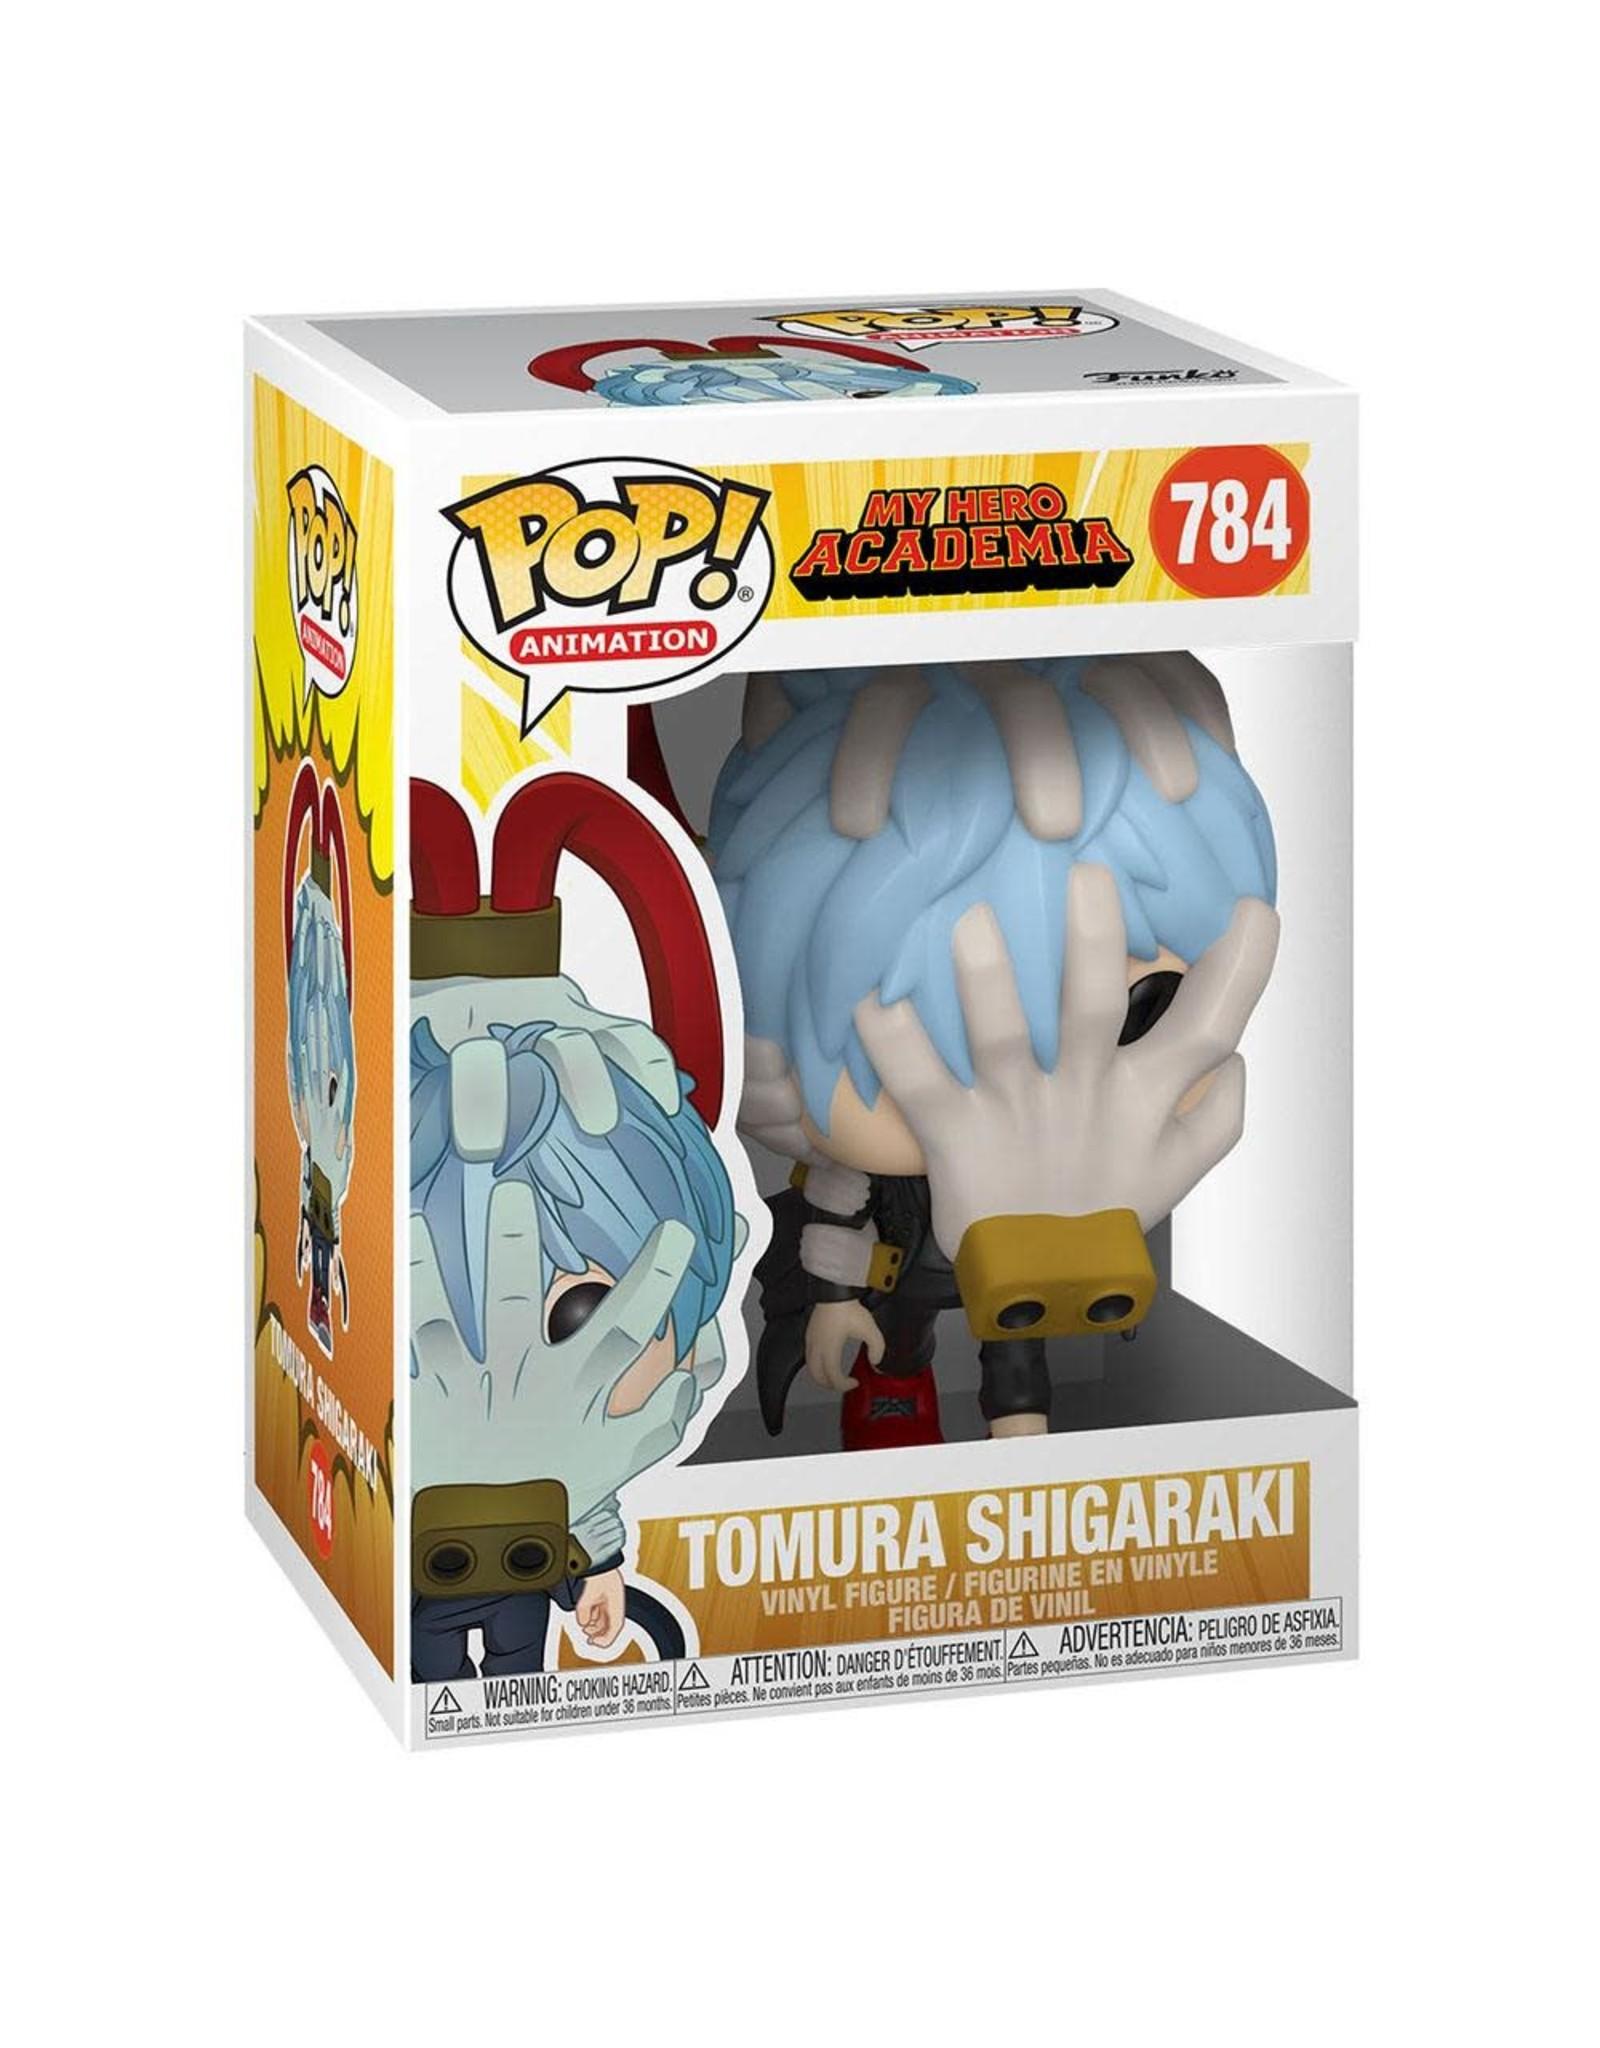 My Hero Academia - Tomura Shigaraki - Funko Pop! Animation 784